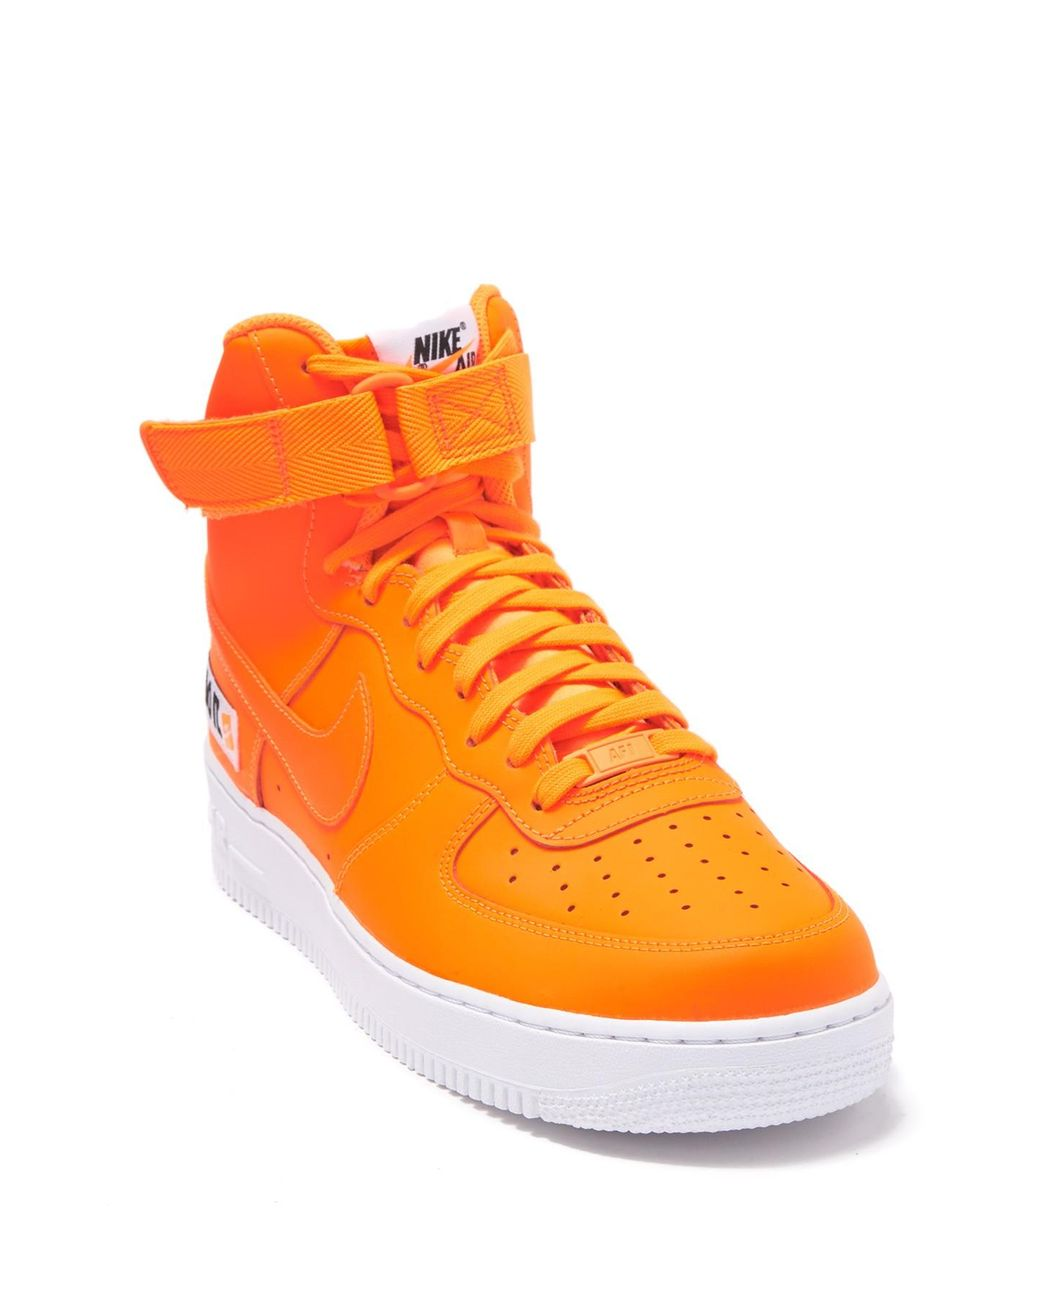 new styles f7c43 0c3ae Men's Orange Air Force 1 High '07 Jdi Sneaker